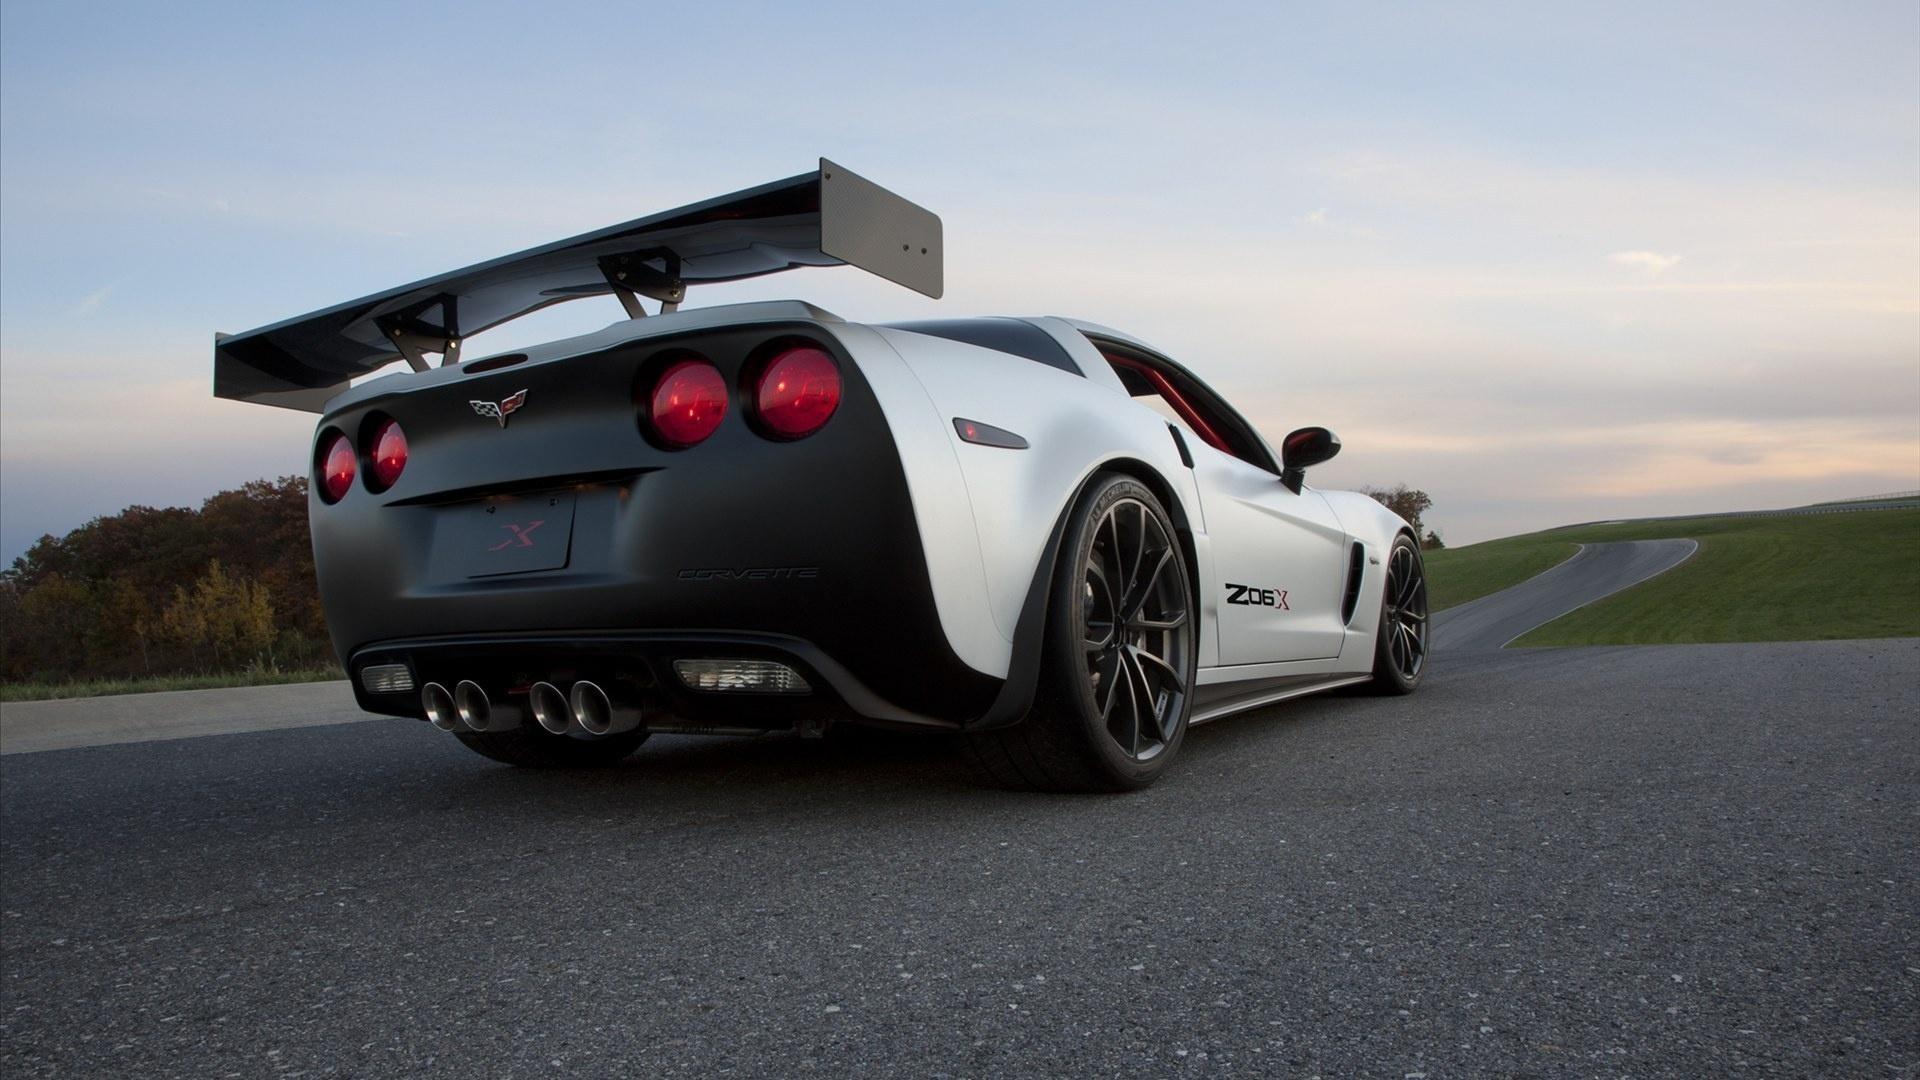 Corvette cool wallpaper